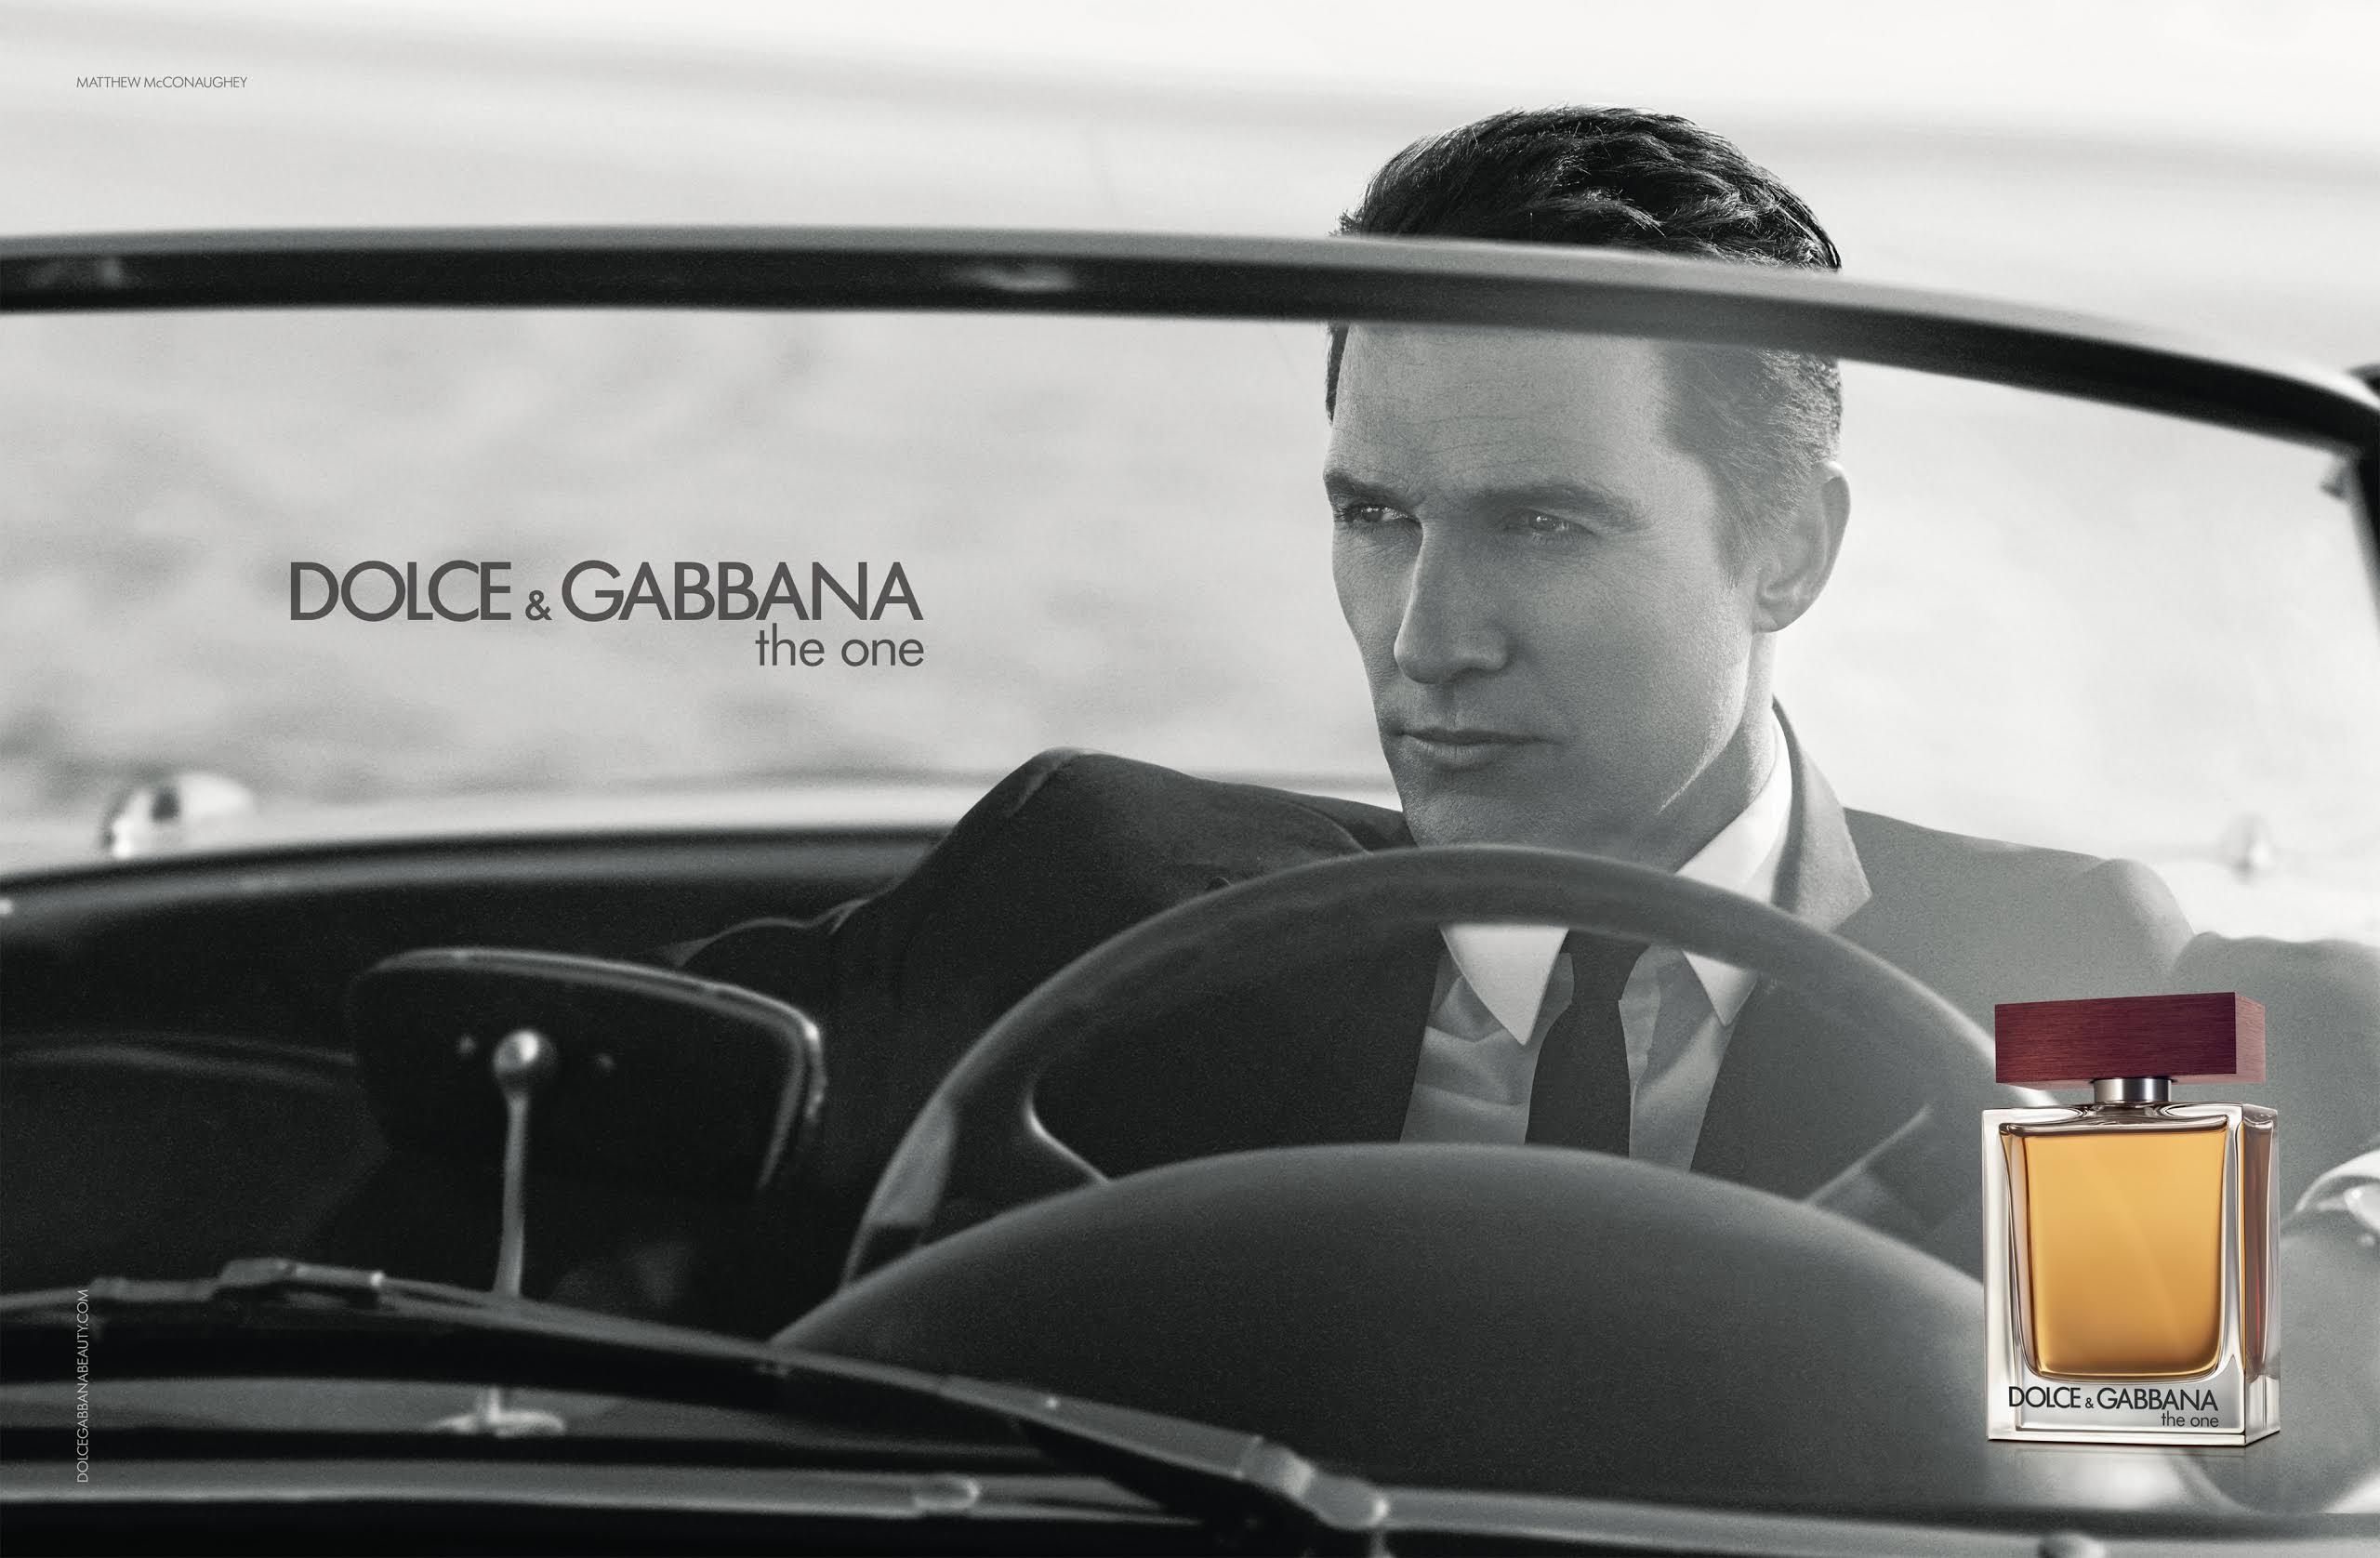 matthew-mcconaughey-dolce-gabbana-the-one-fragrance-campaign